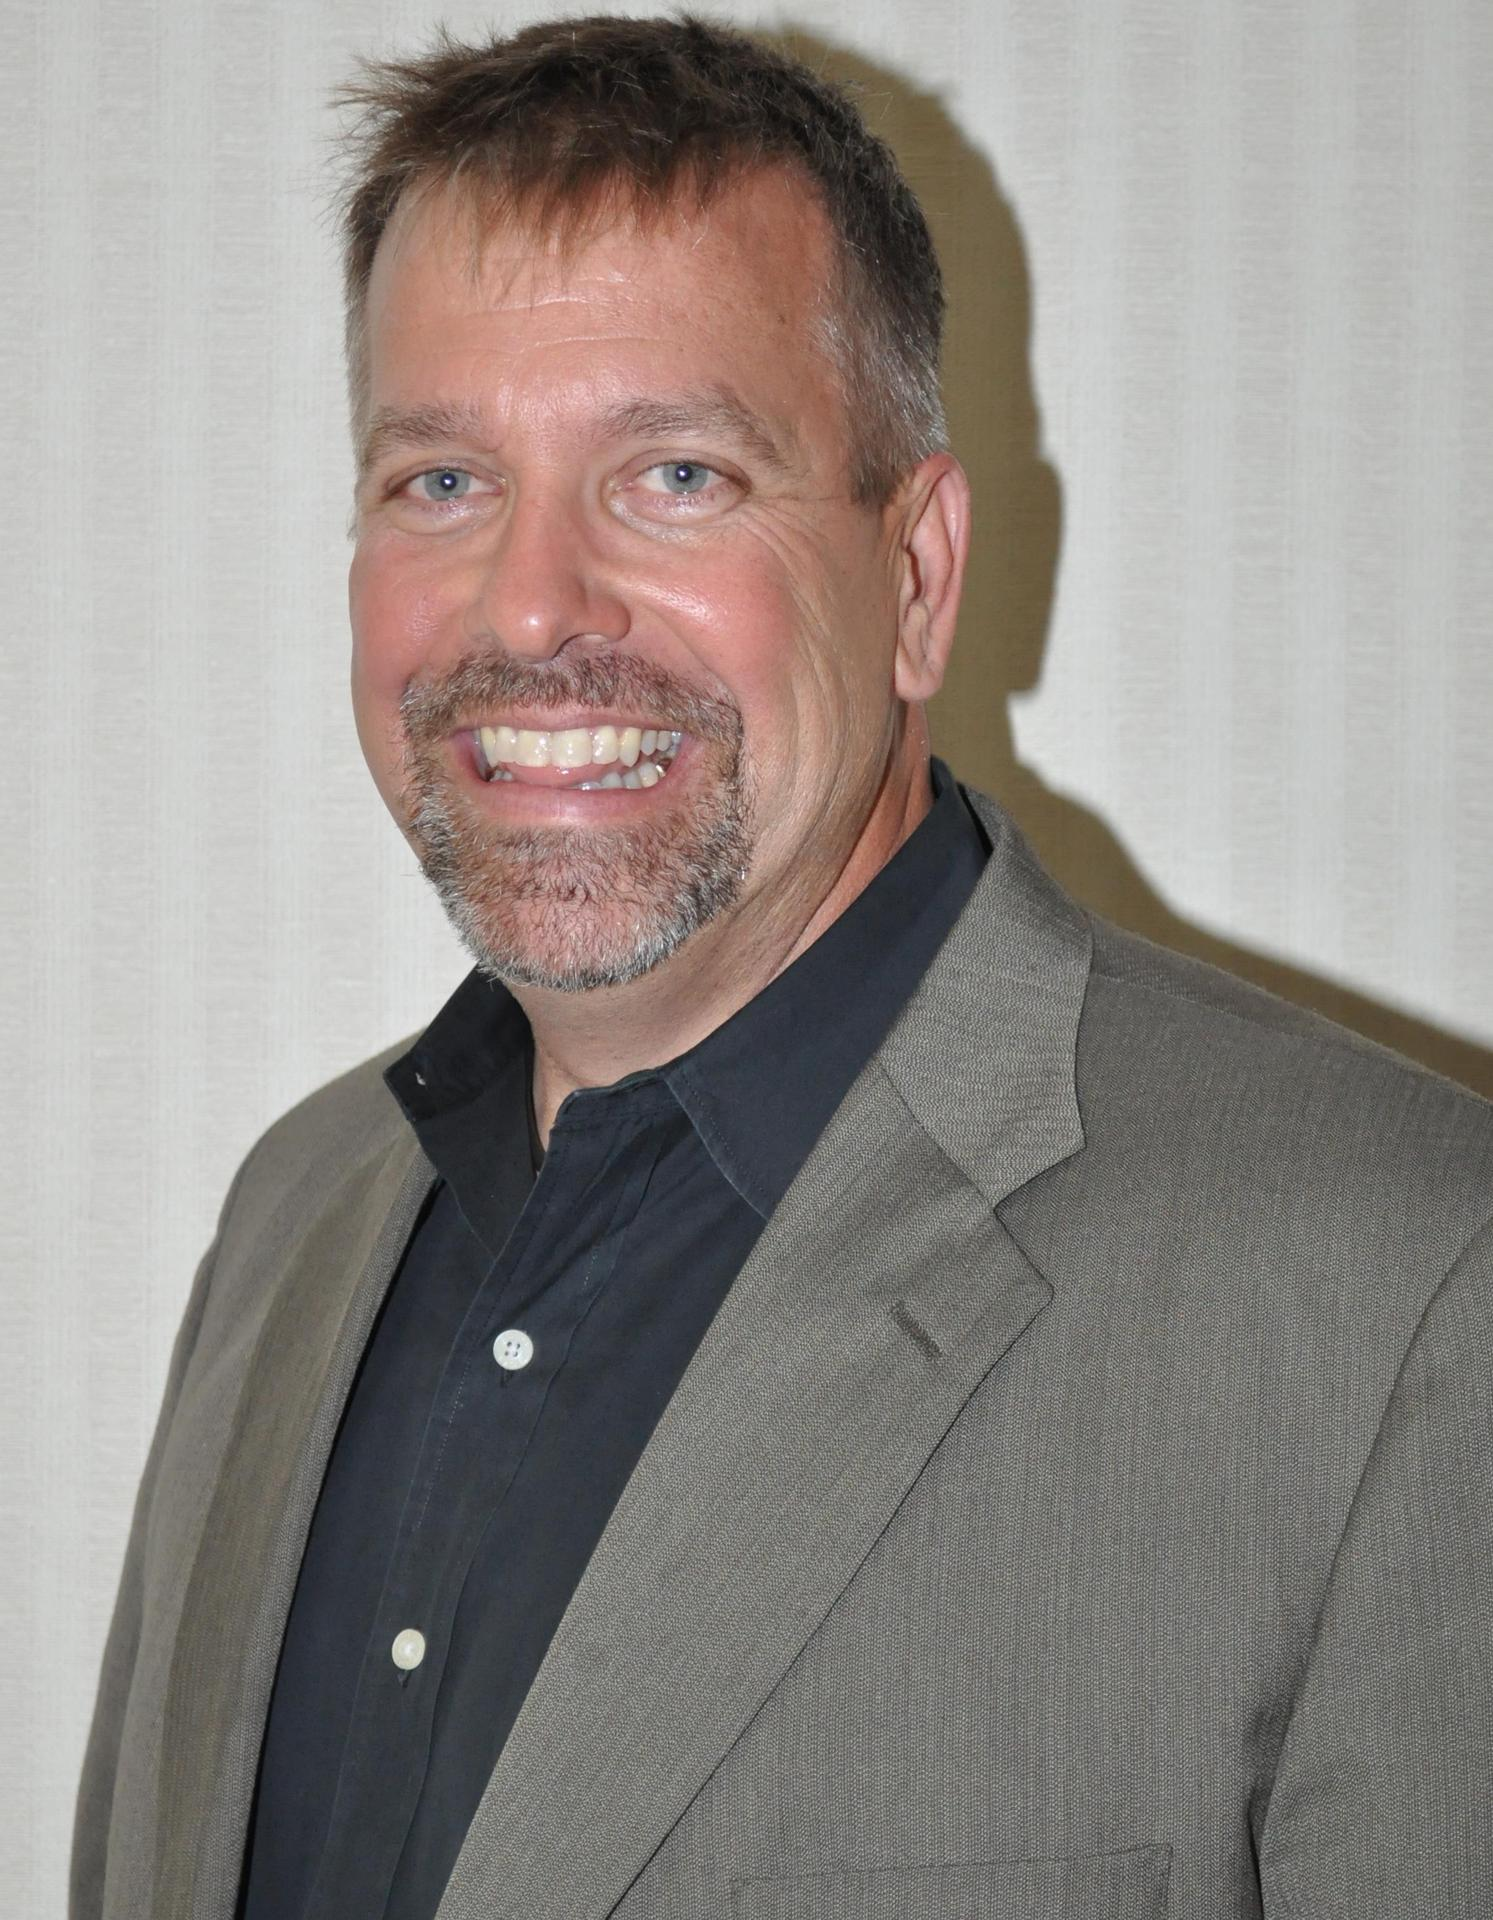 Dr. Ed Dittfurth